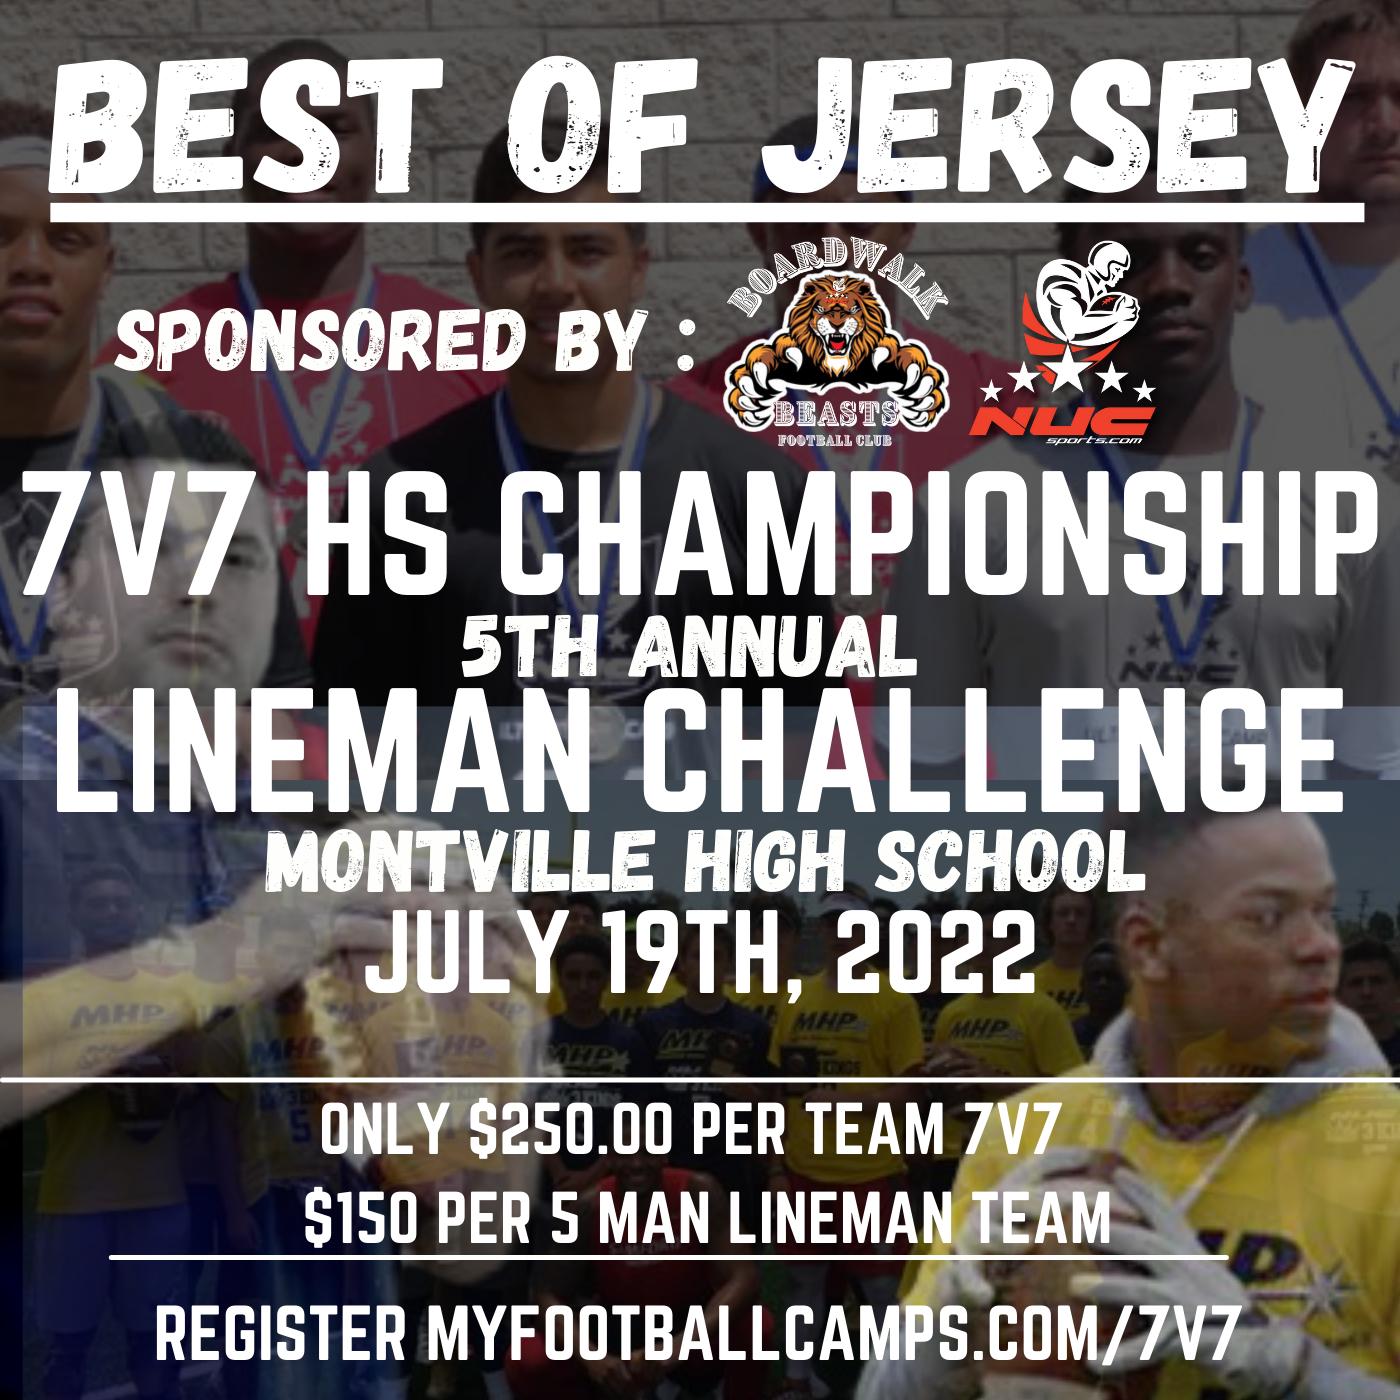 Best of Jersey 7v7 Tournament and Linemen Challenge, July 19th, 2022 Montville, NJ 24 Team Max